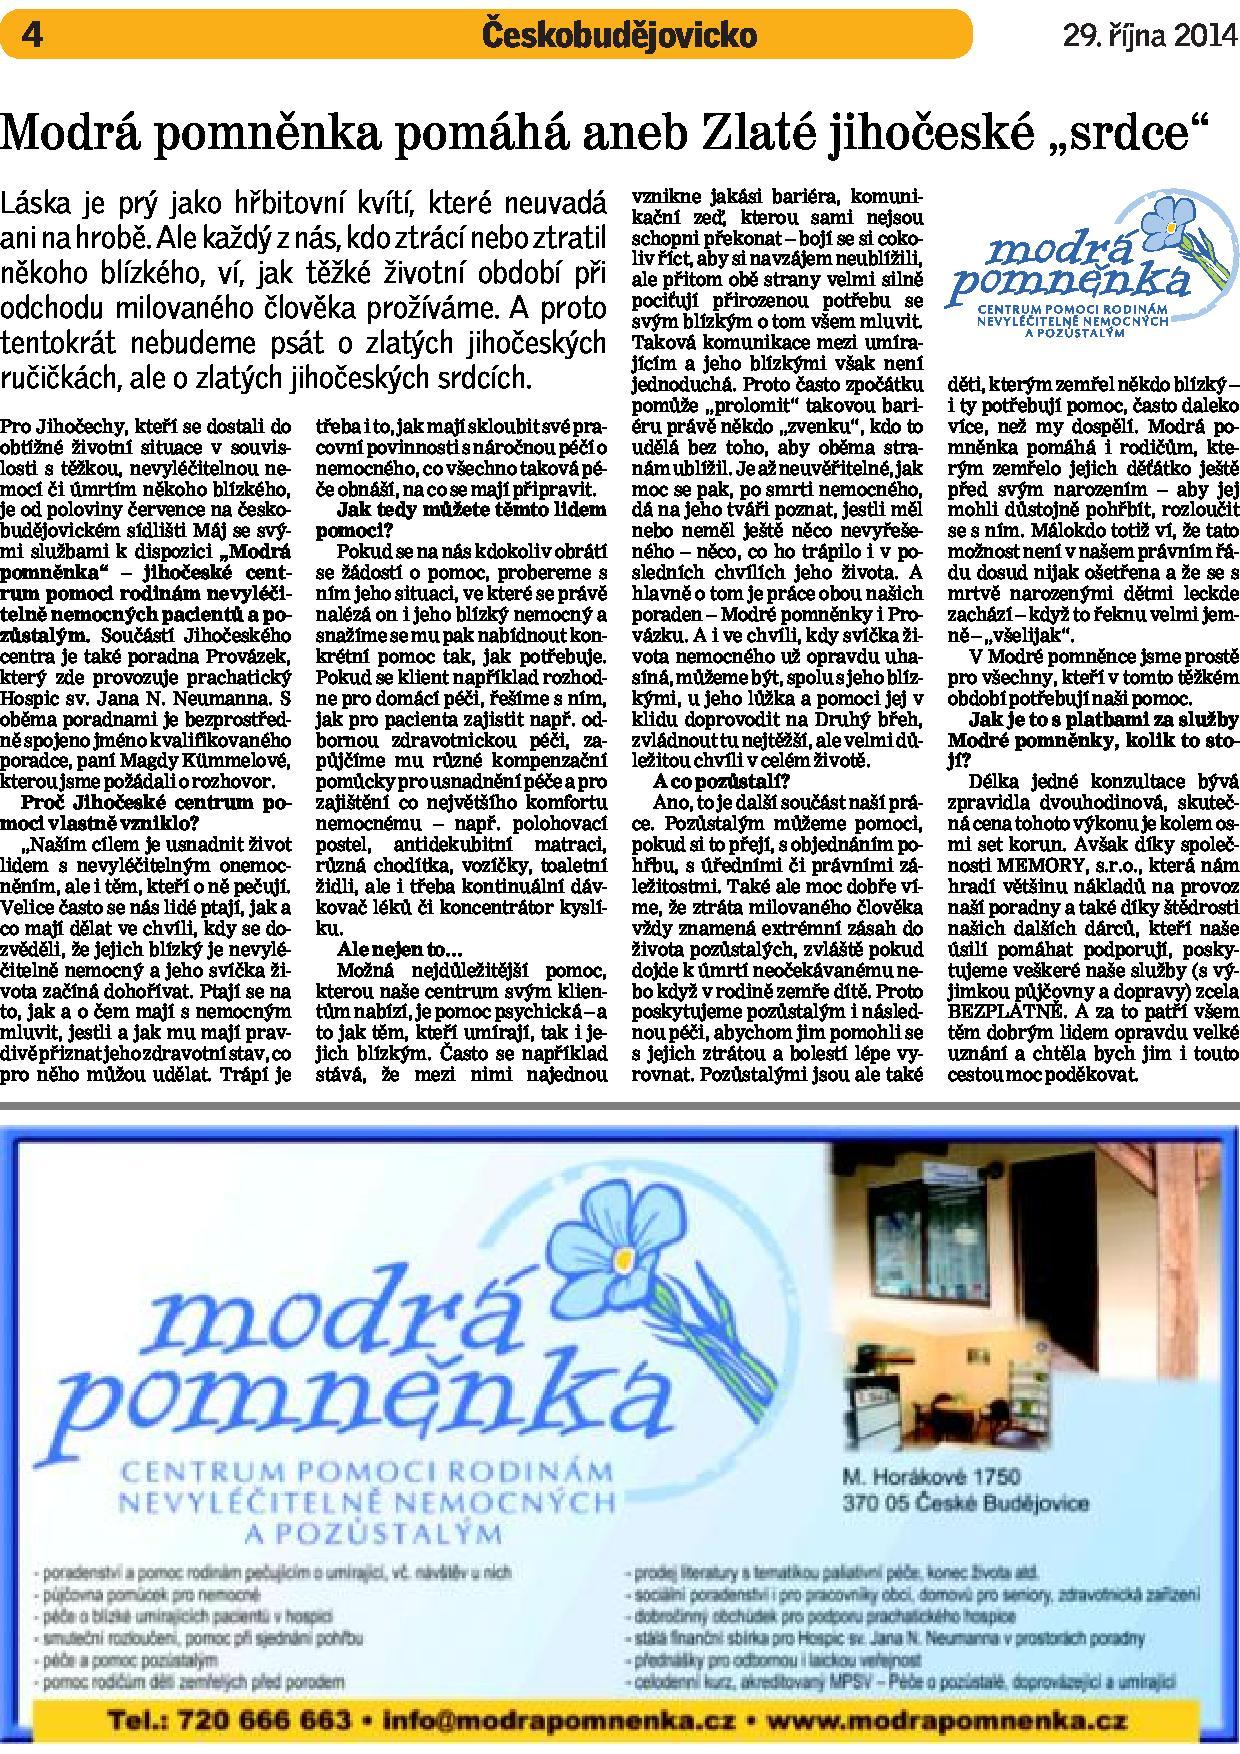 Denik_modra_pomnenka_Zlate_srdce